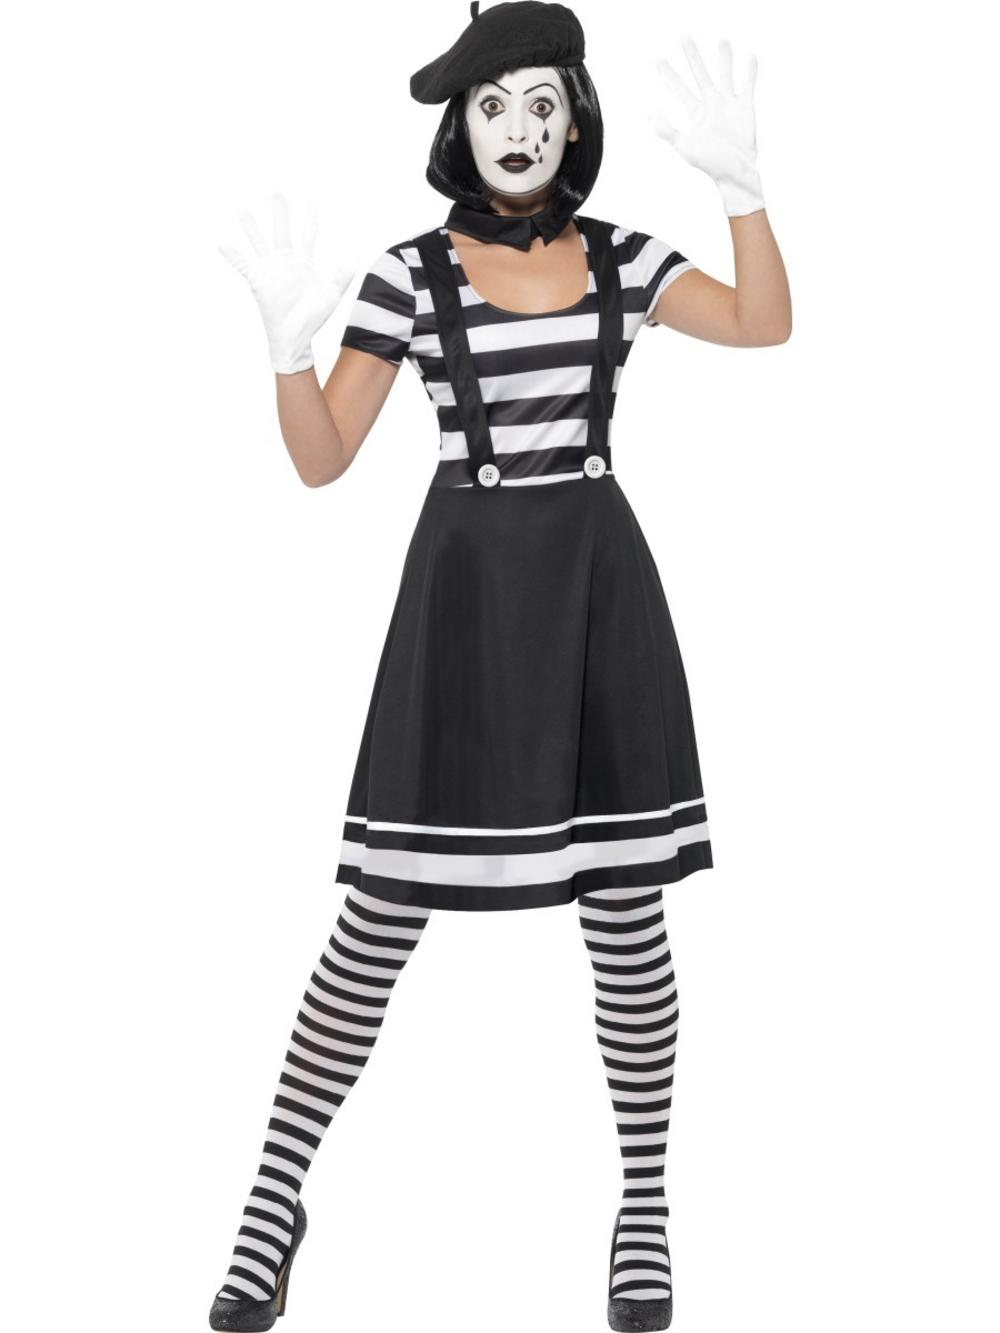 Lady Mime Artist Costume